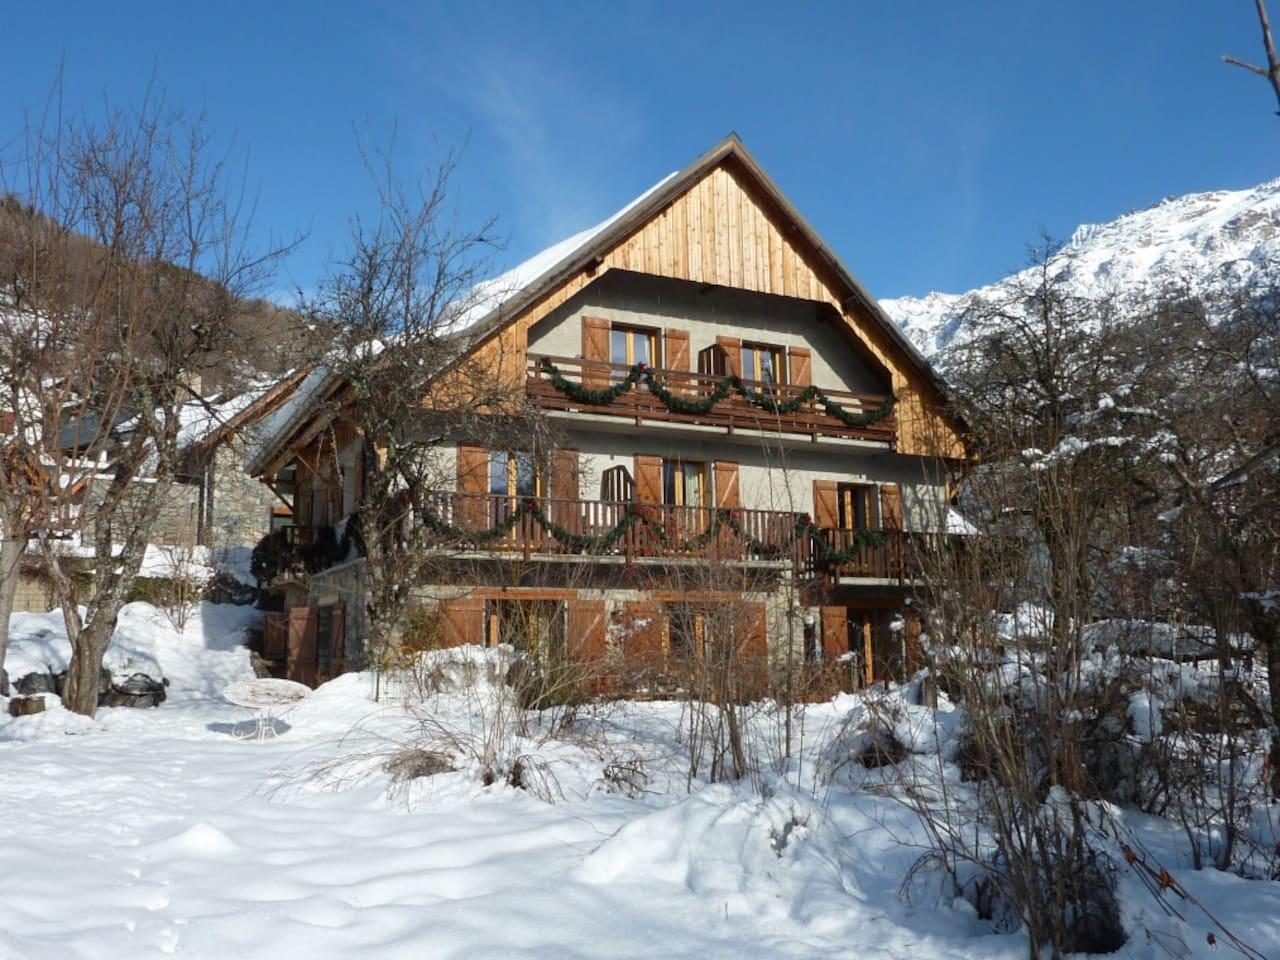 Chalet Solneige in winter